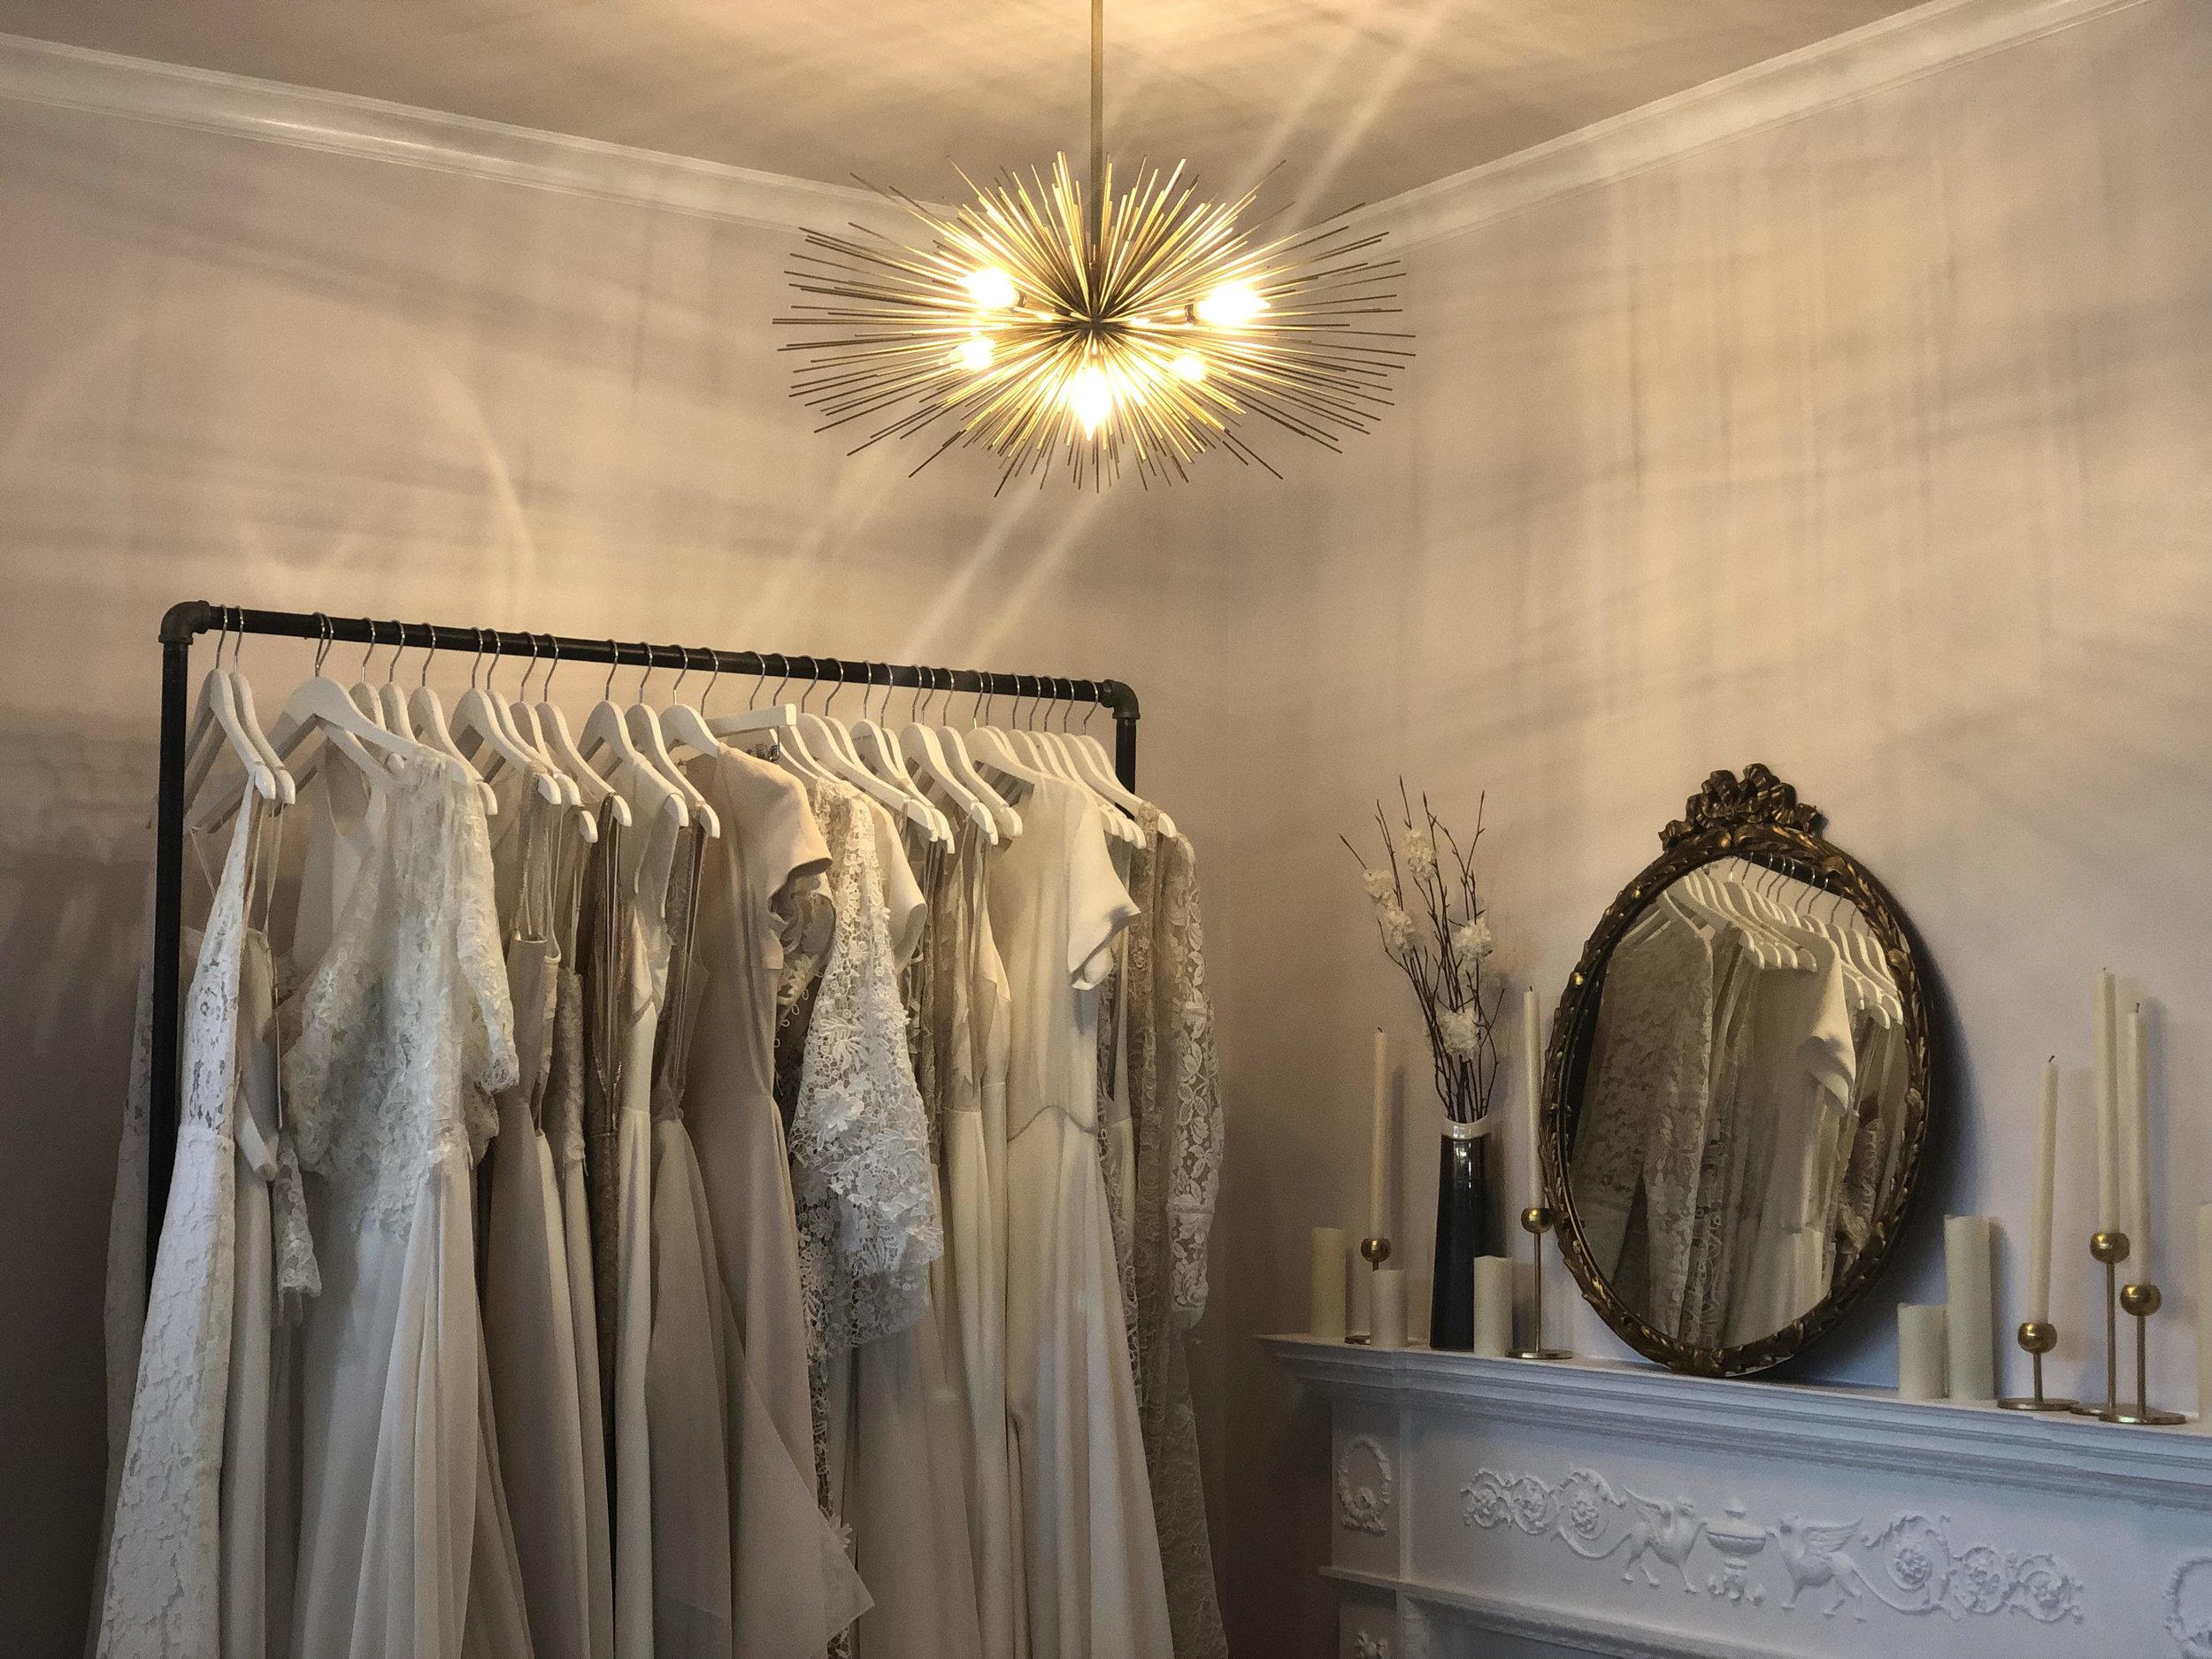 seattle-bridal-shop-wedding-dress.jpg